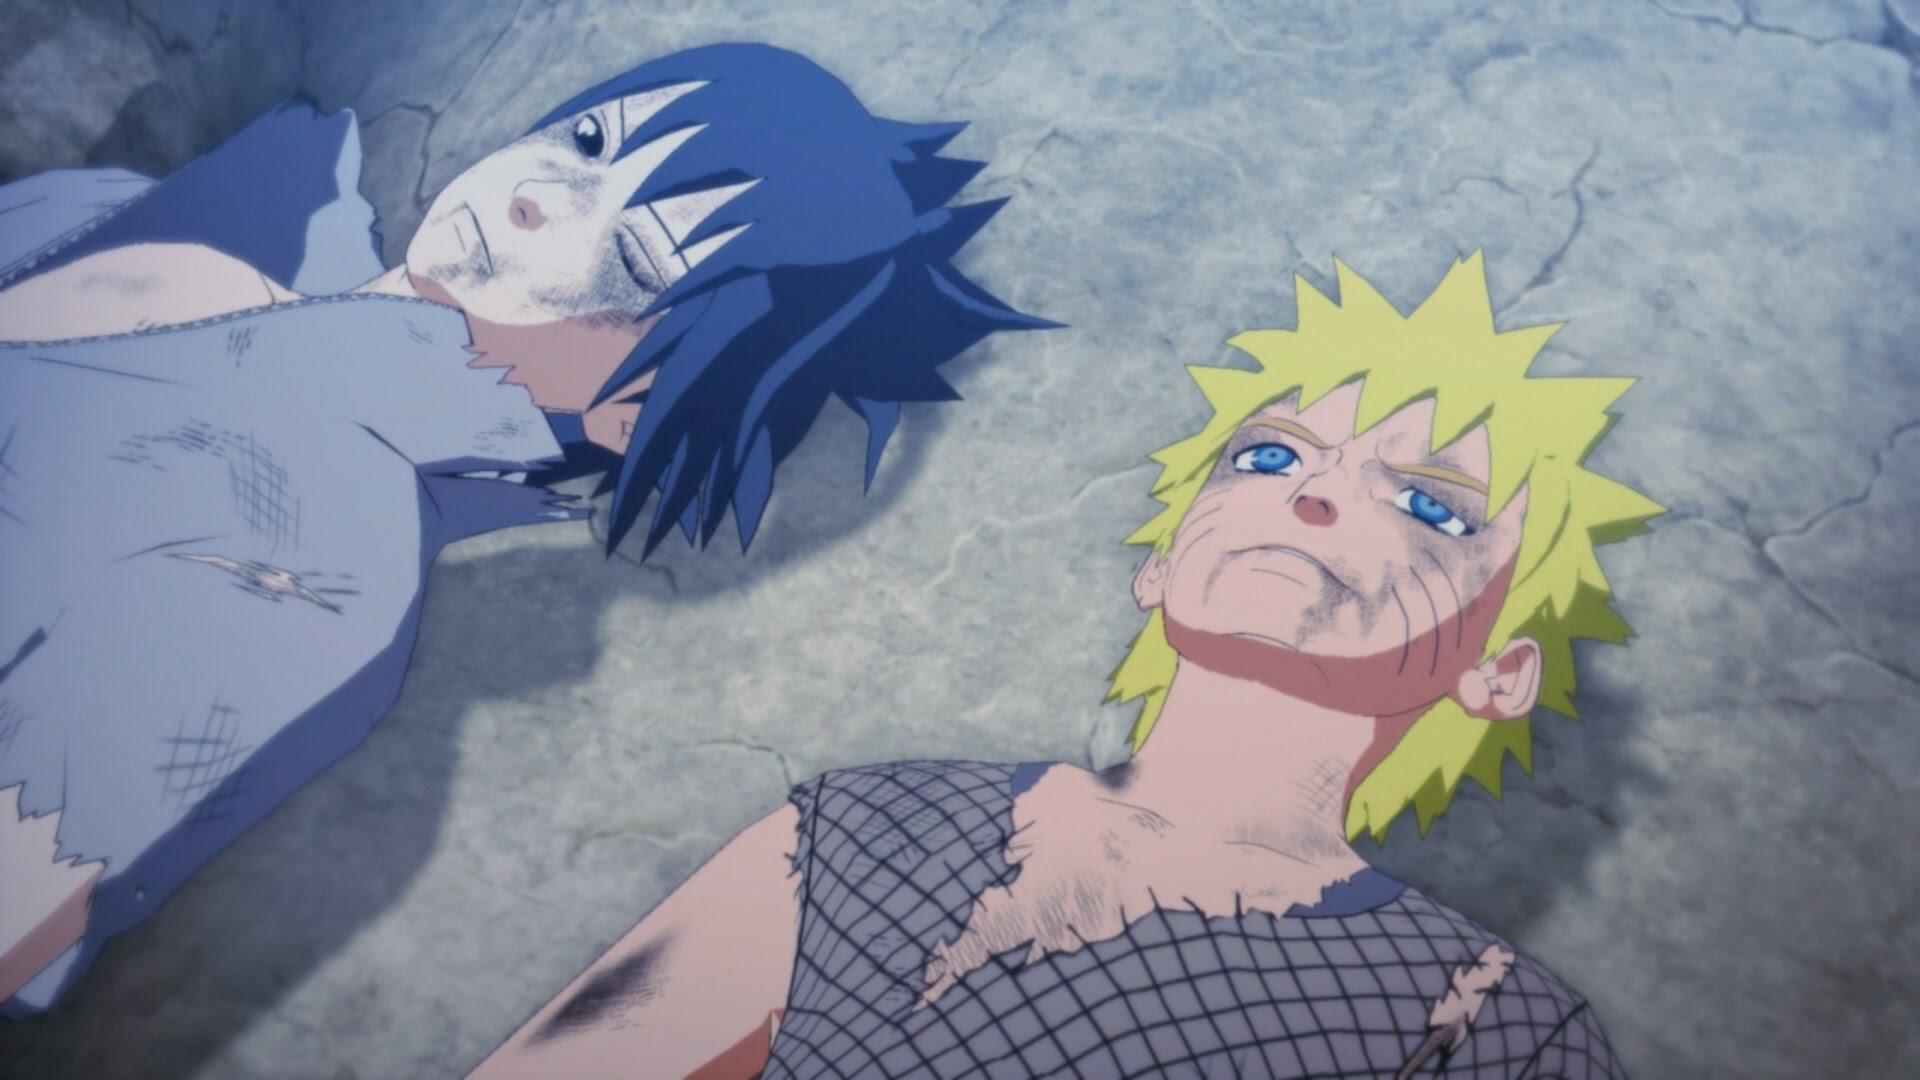 Naruto Shippuden Ultimate Ninja Storm 4 - Final Boss Fight Naruto vs